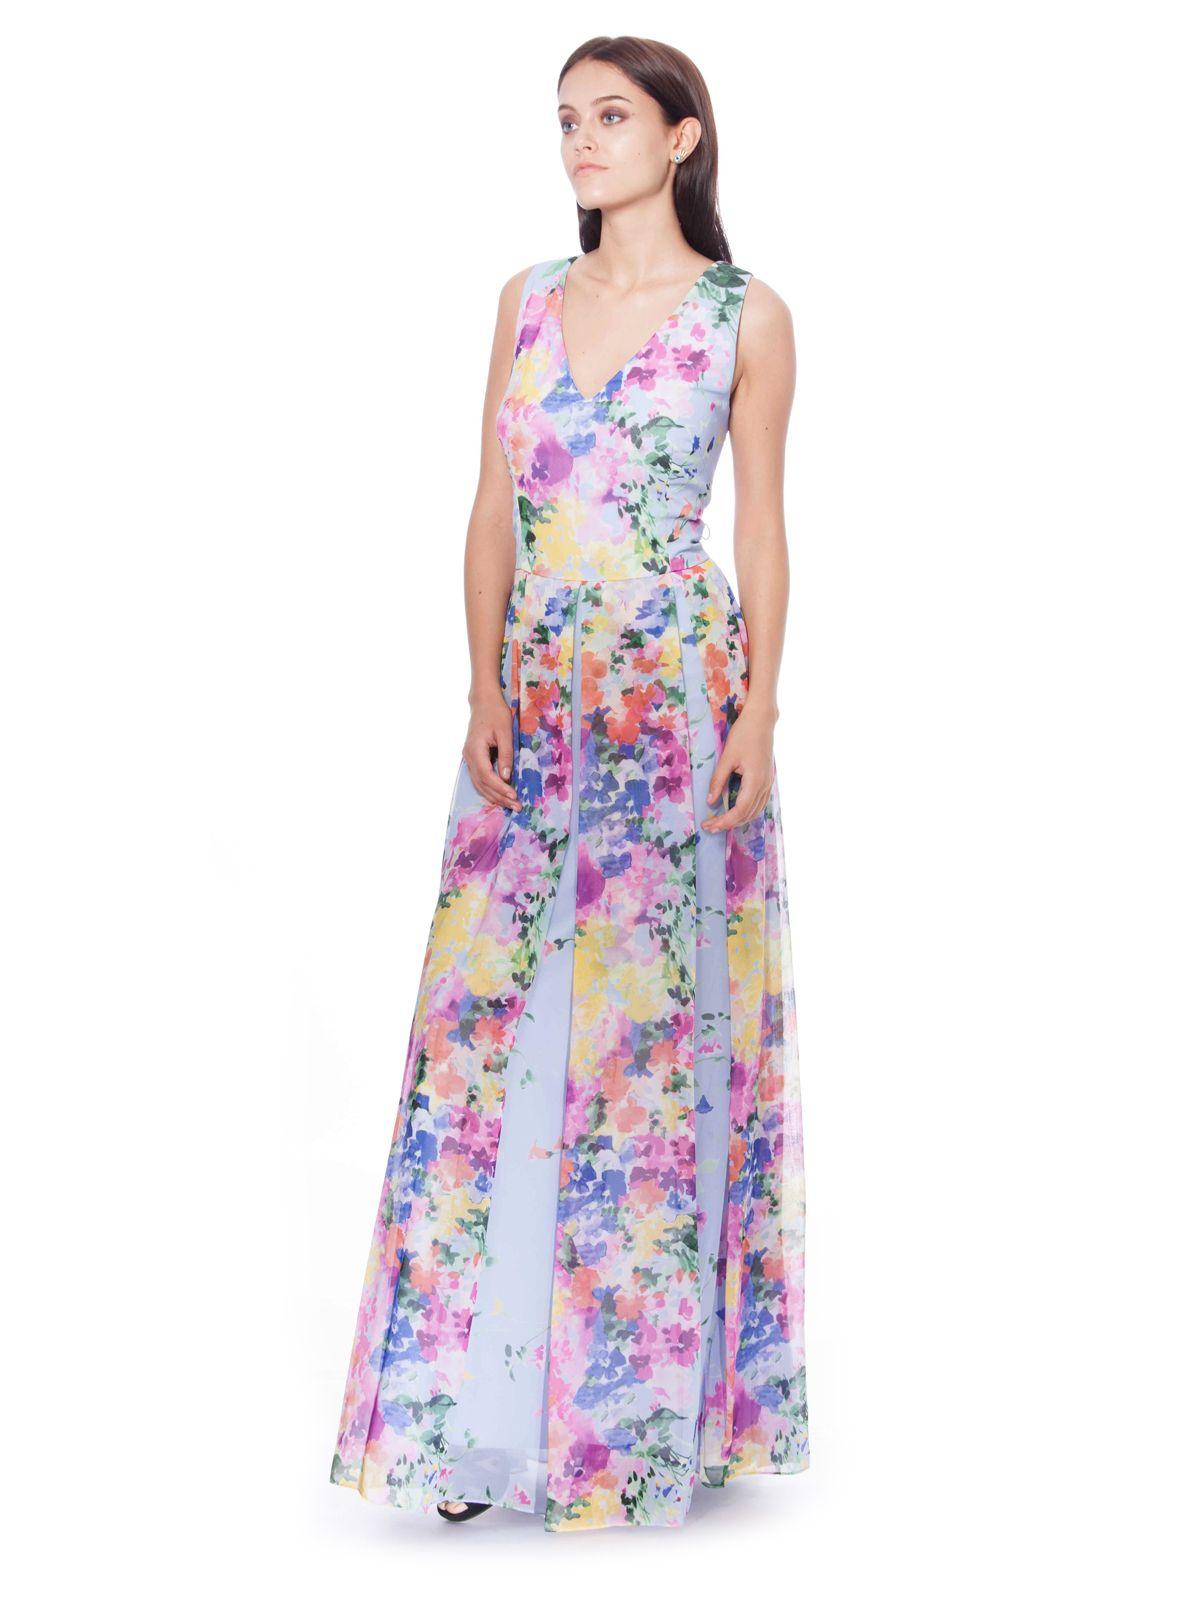 DAVID MEISTER Floral printed chiffon gown  gown  gownstyle  eveningwear   eveninggown  designerwear  designerdress  onlineshopping  dubai  fashion   style ... a240c89fc